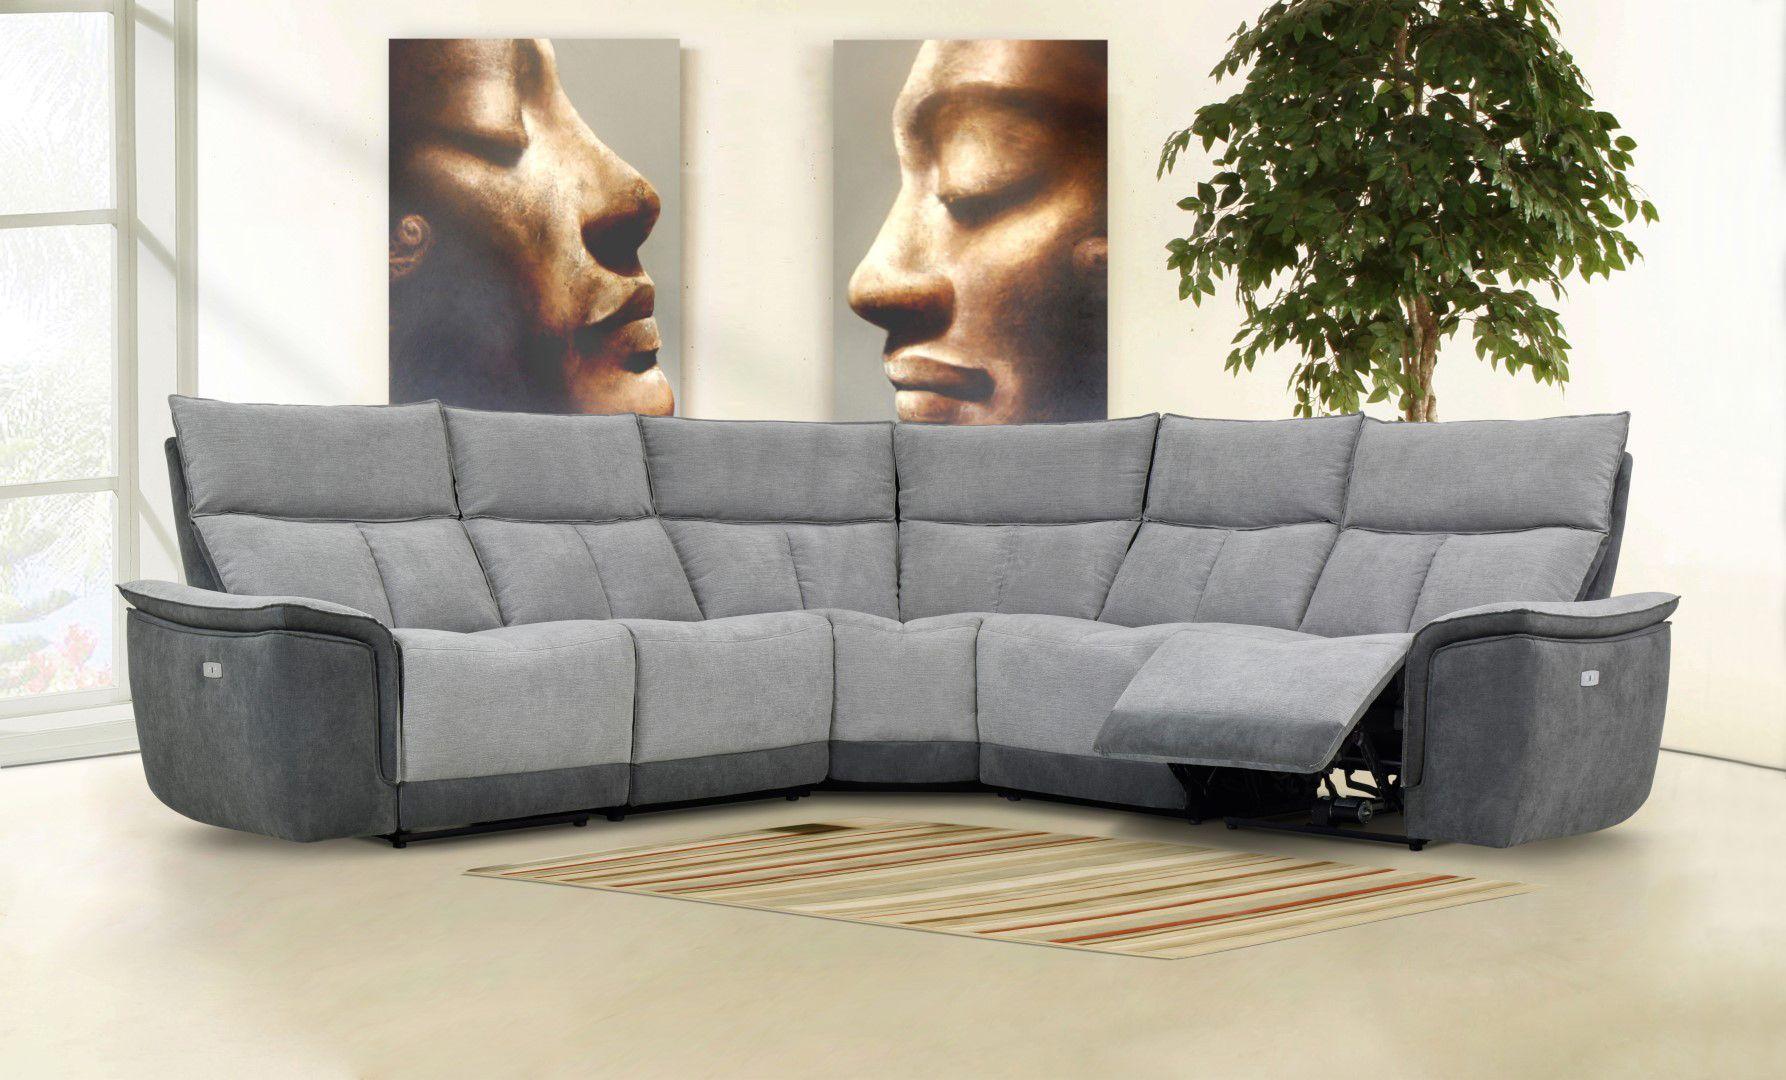 Stefano Corner Power Recliner Graceland Fabric Sofa Set In Metal Dark Grey Power Recliners Sofa Set Fabric Sofa